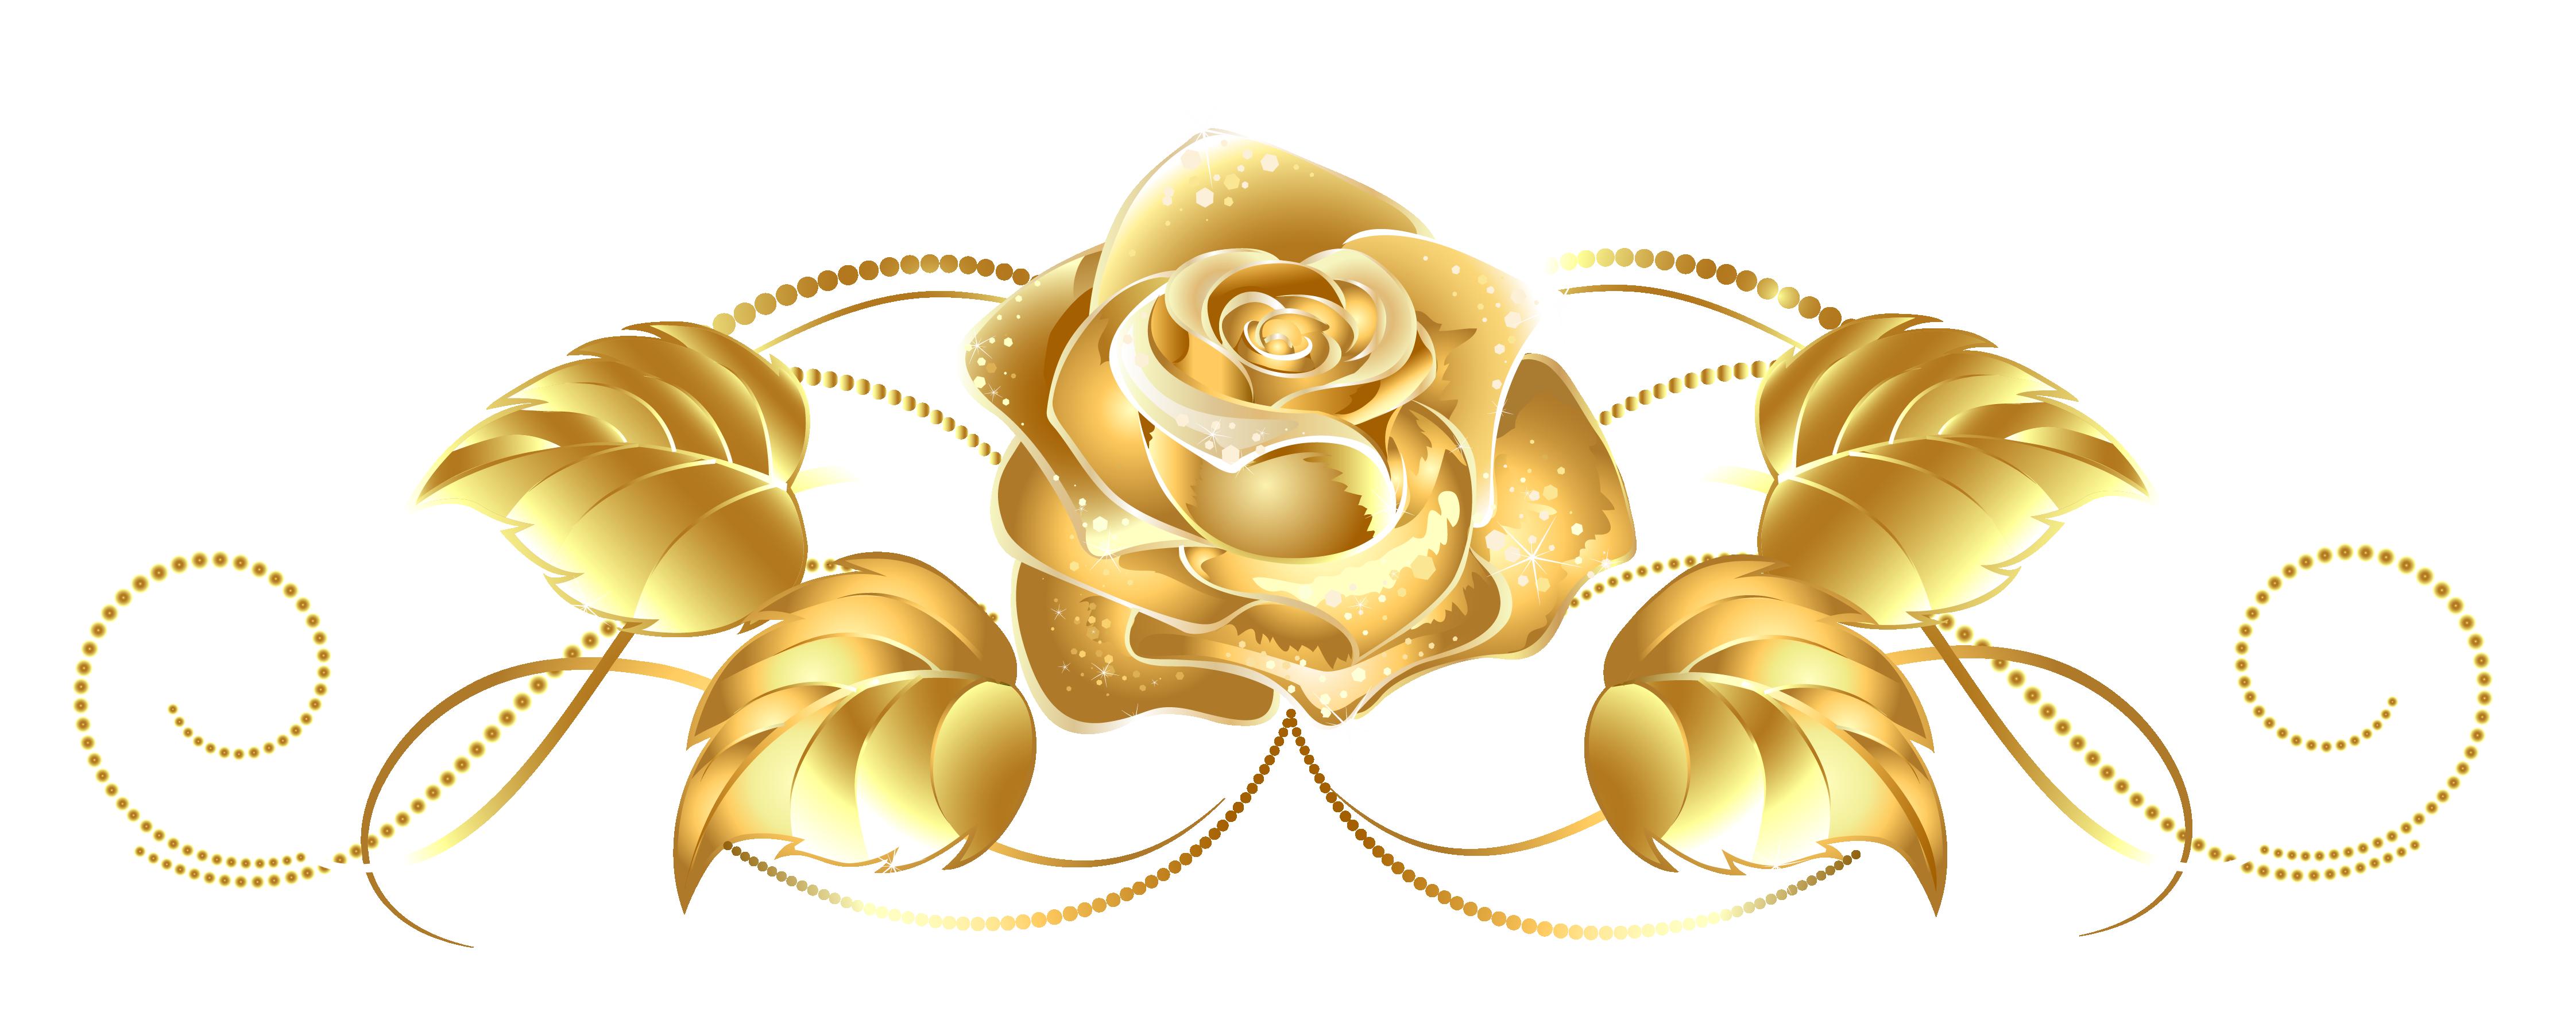 Gold Png Image PNG Image - Gold PNG